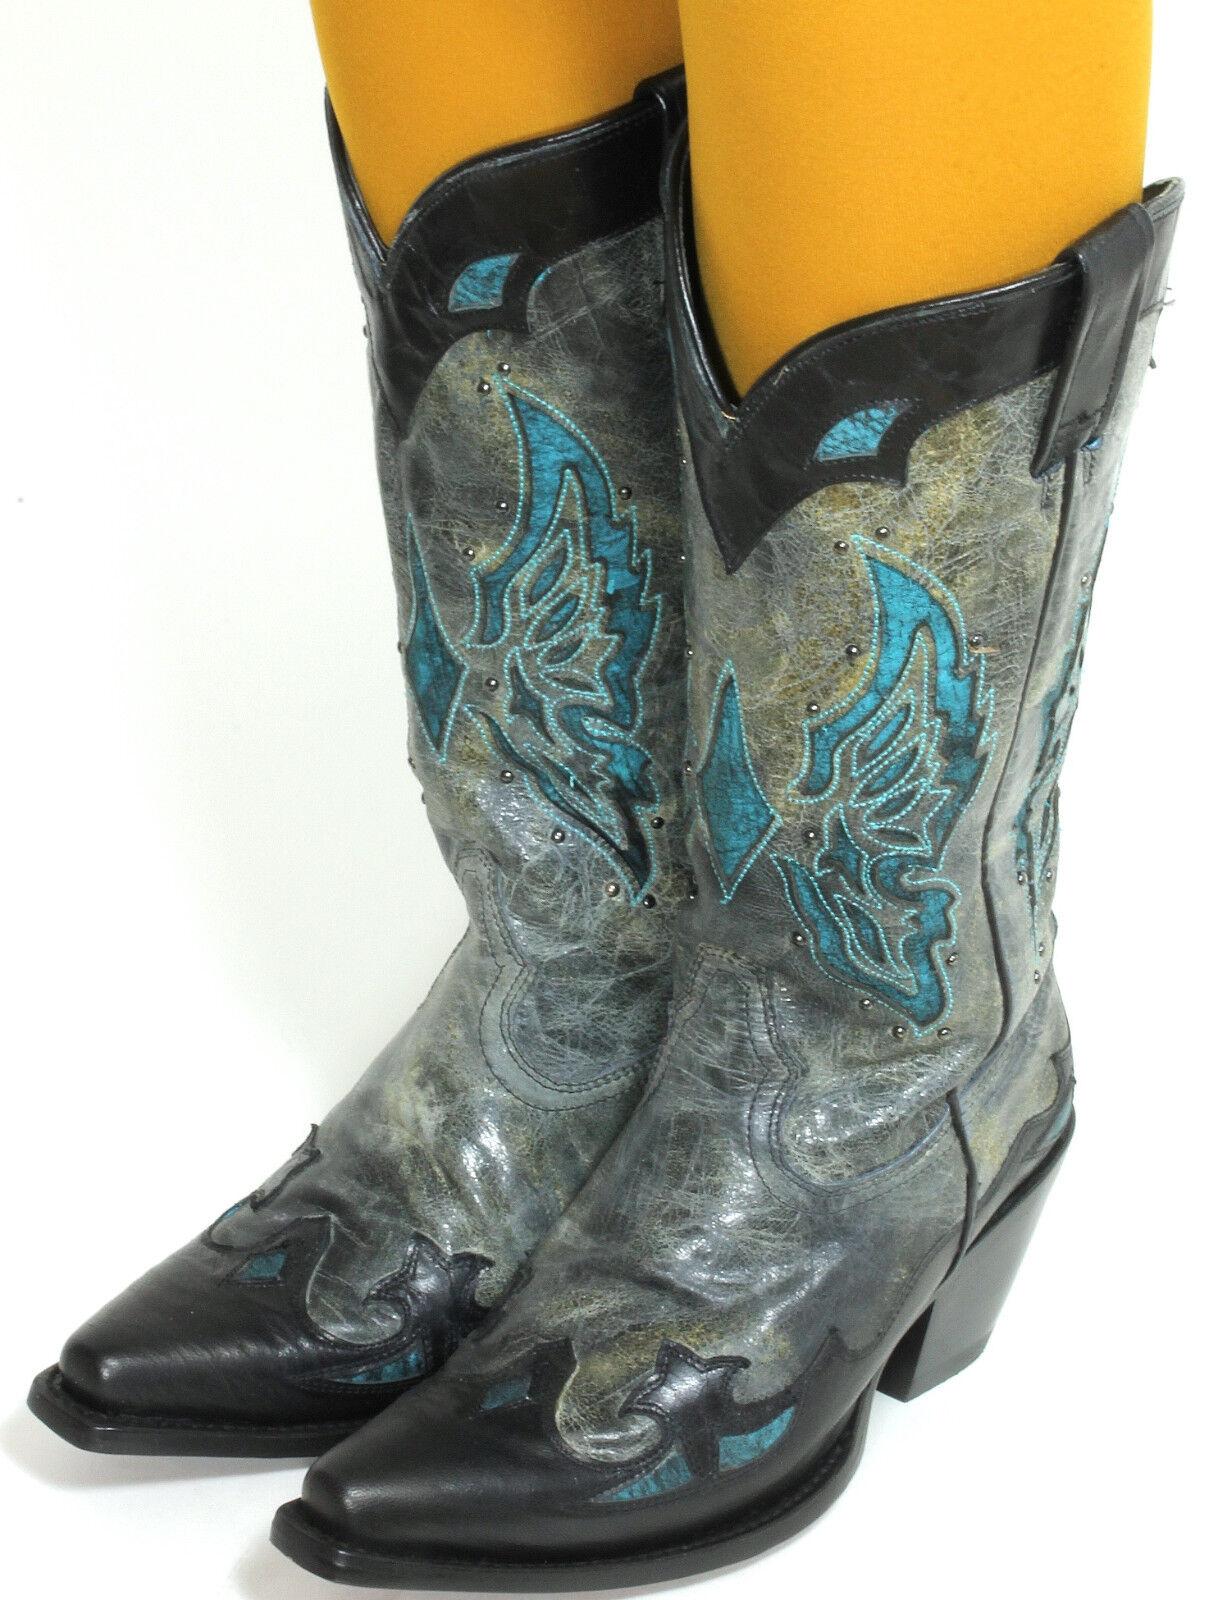 19 Cowboystiefel Westernstiefel Texas Texas Texas Rudel Catalan Style Stiefel Fashion 38 74f8c6